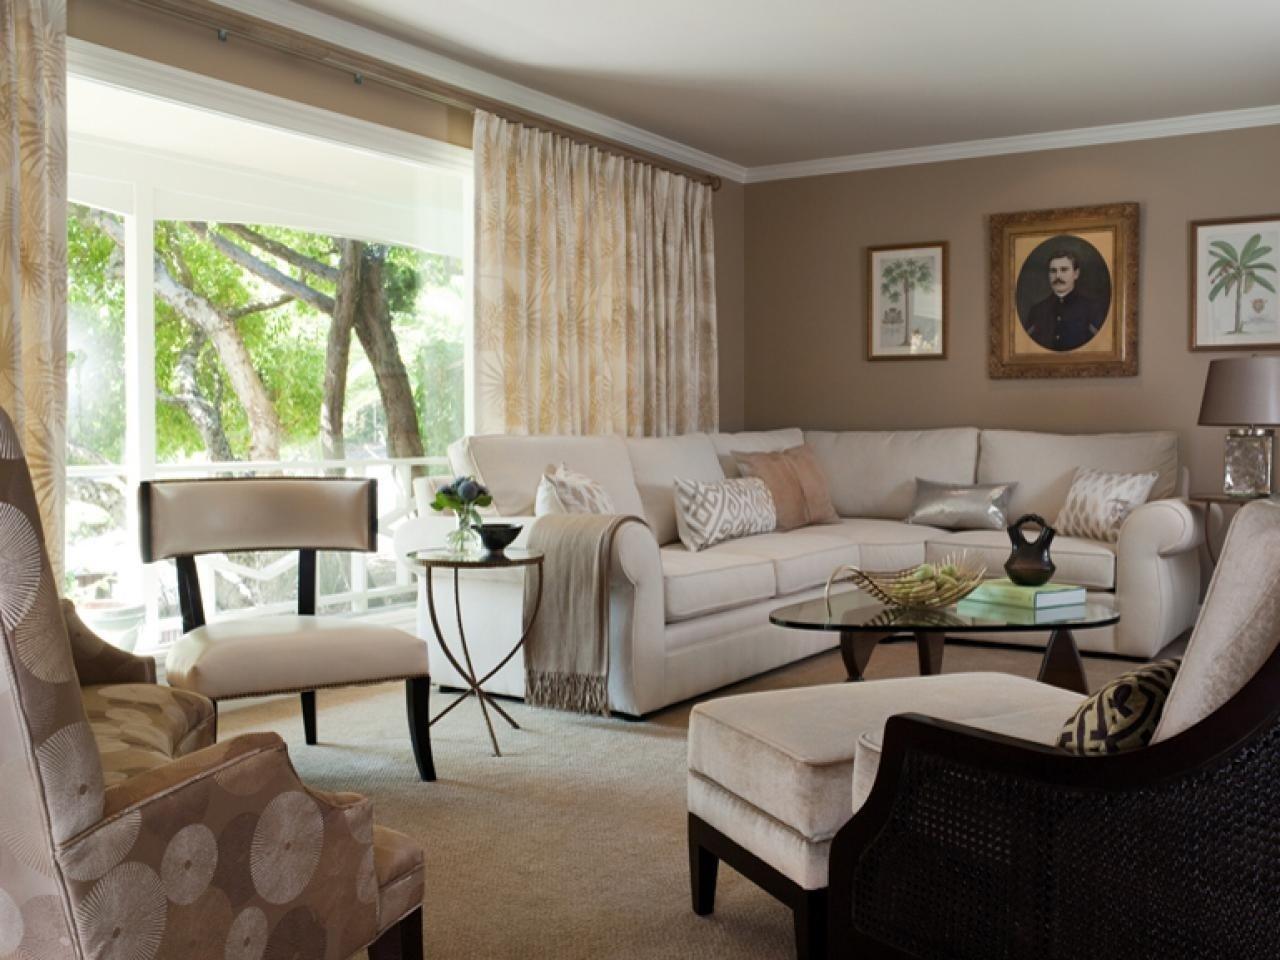 10 Stylish Hgtv Living Room Decorating Ideas stunning ideas hgtv living rooms cozy design living room makeover 2021